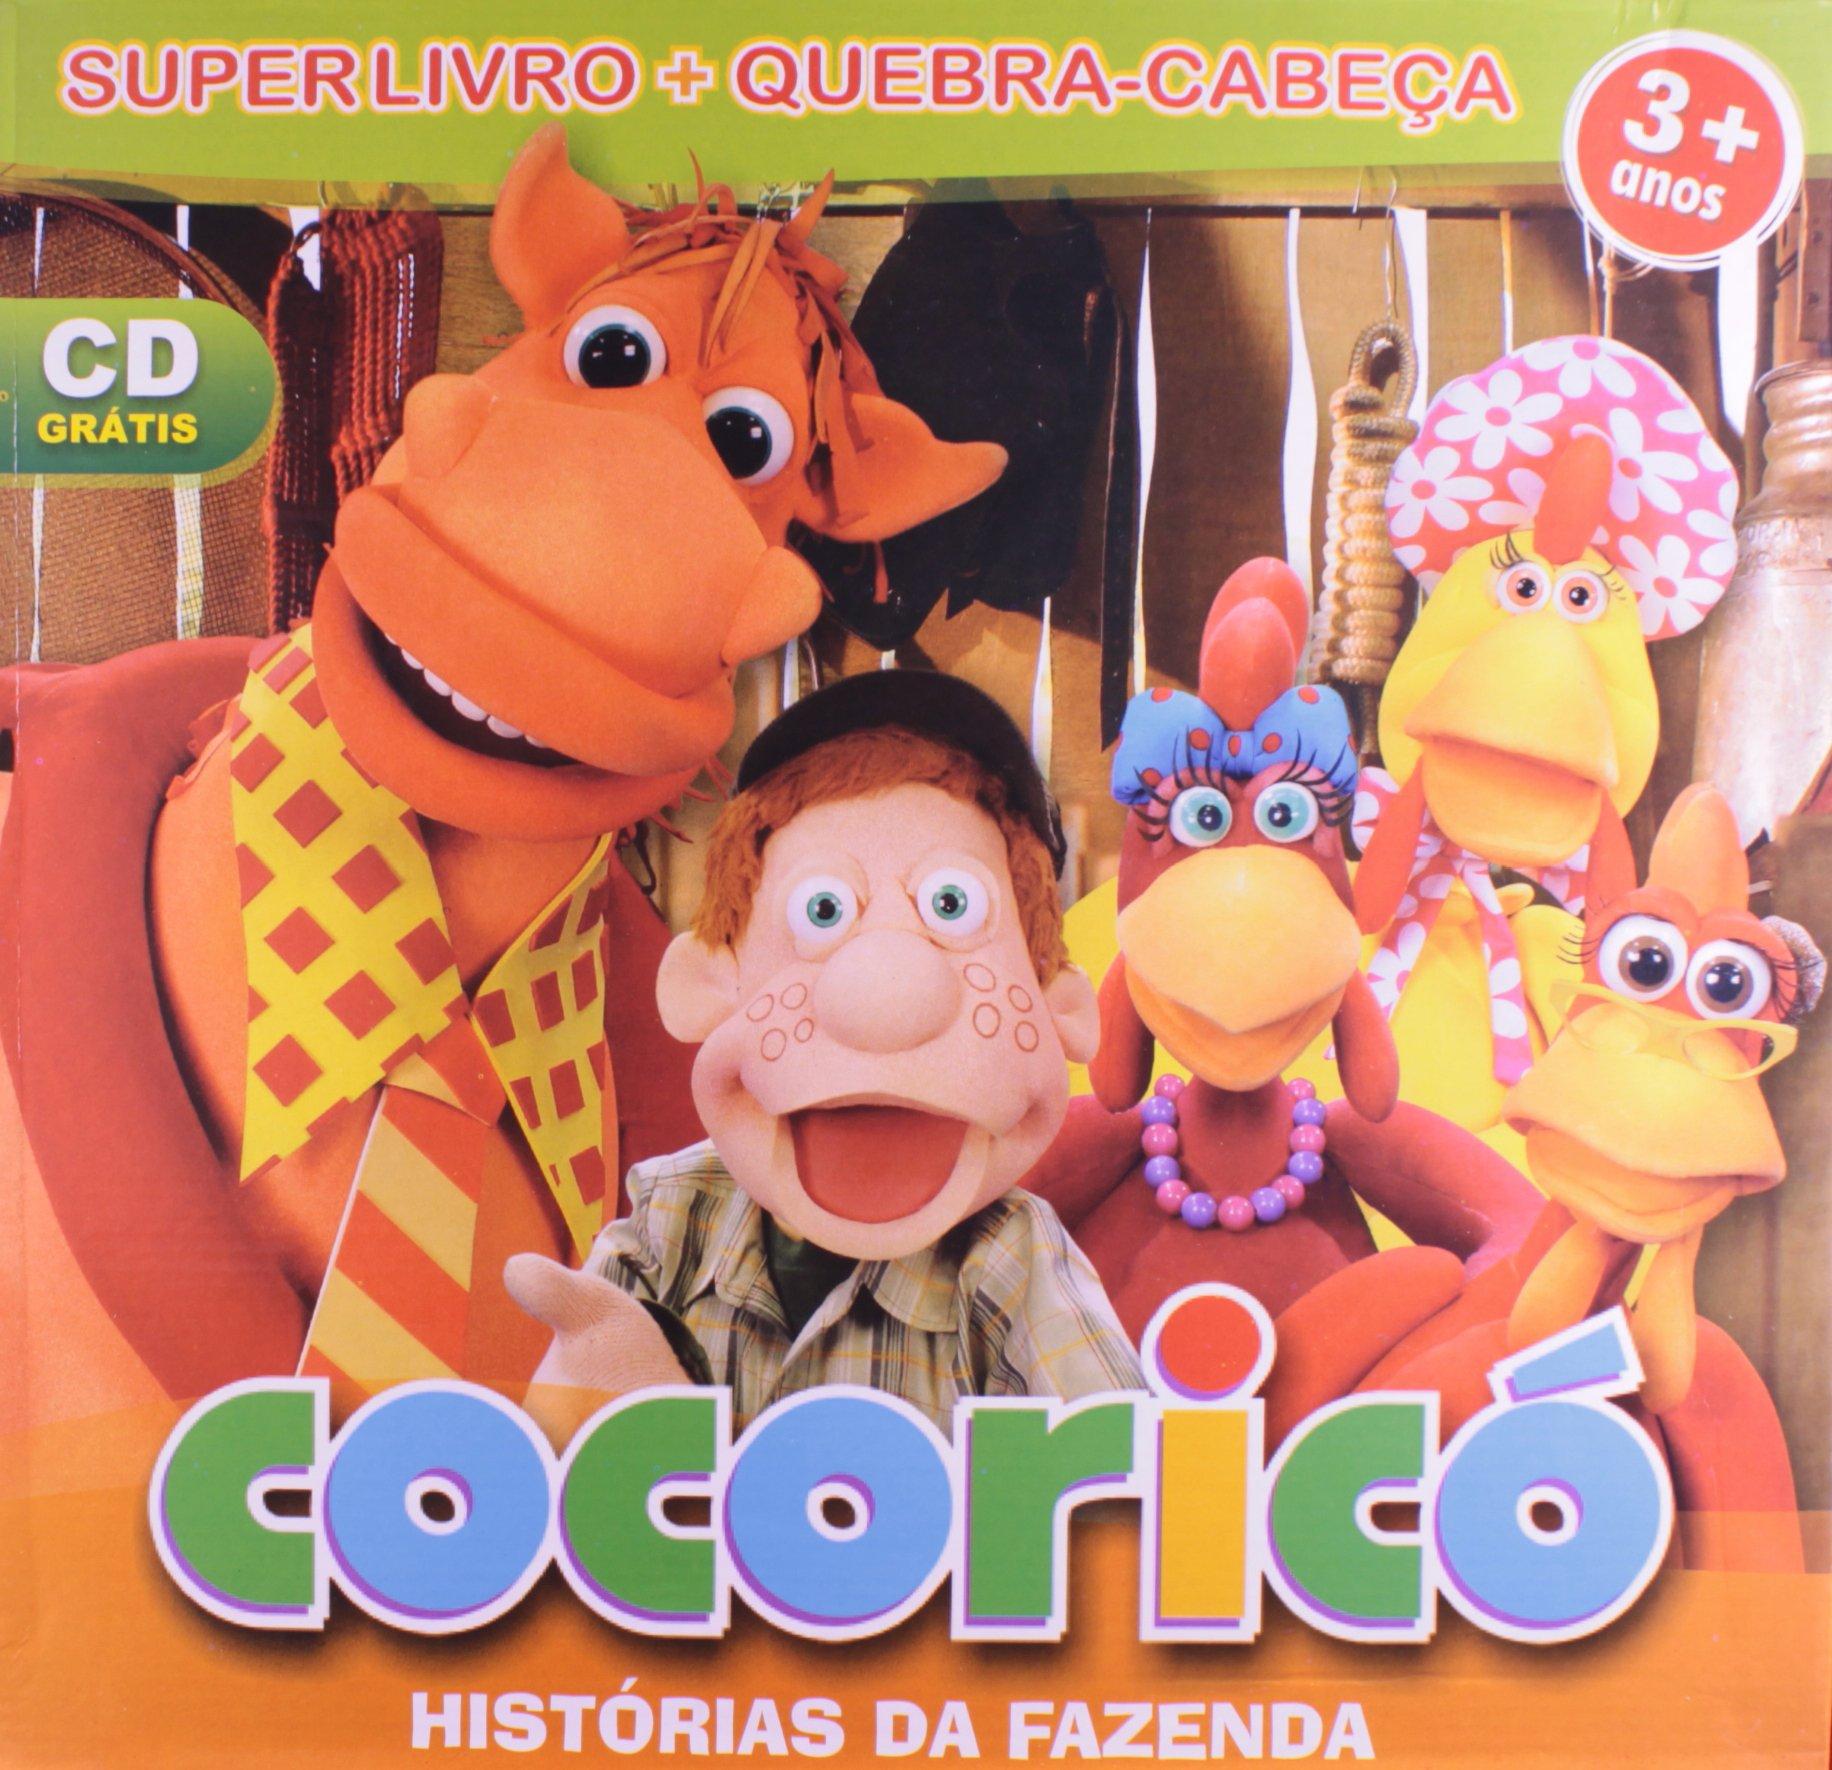 cd do cocorico gratis